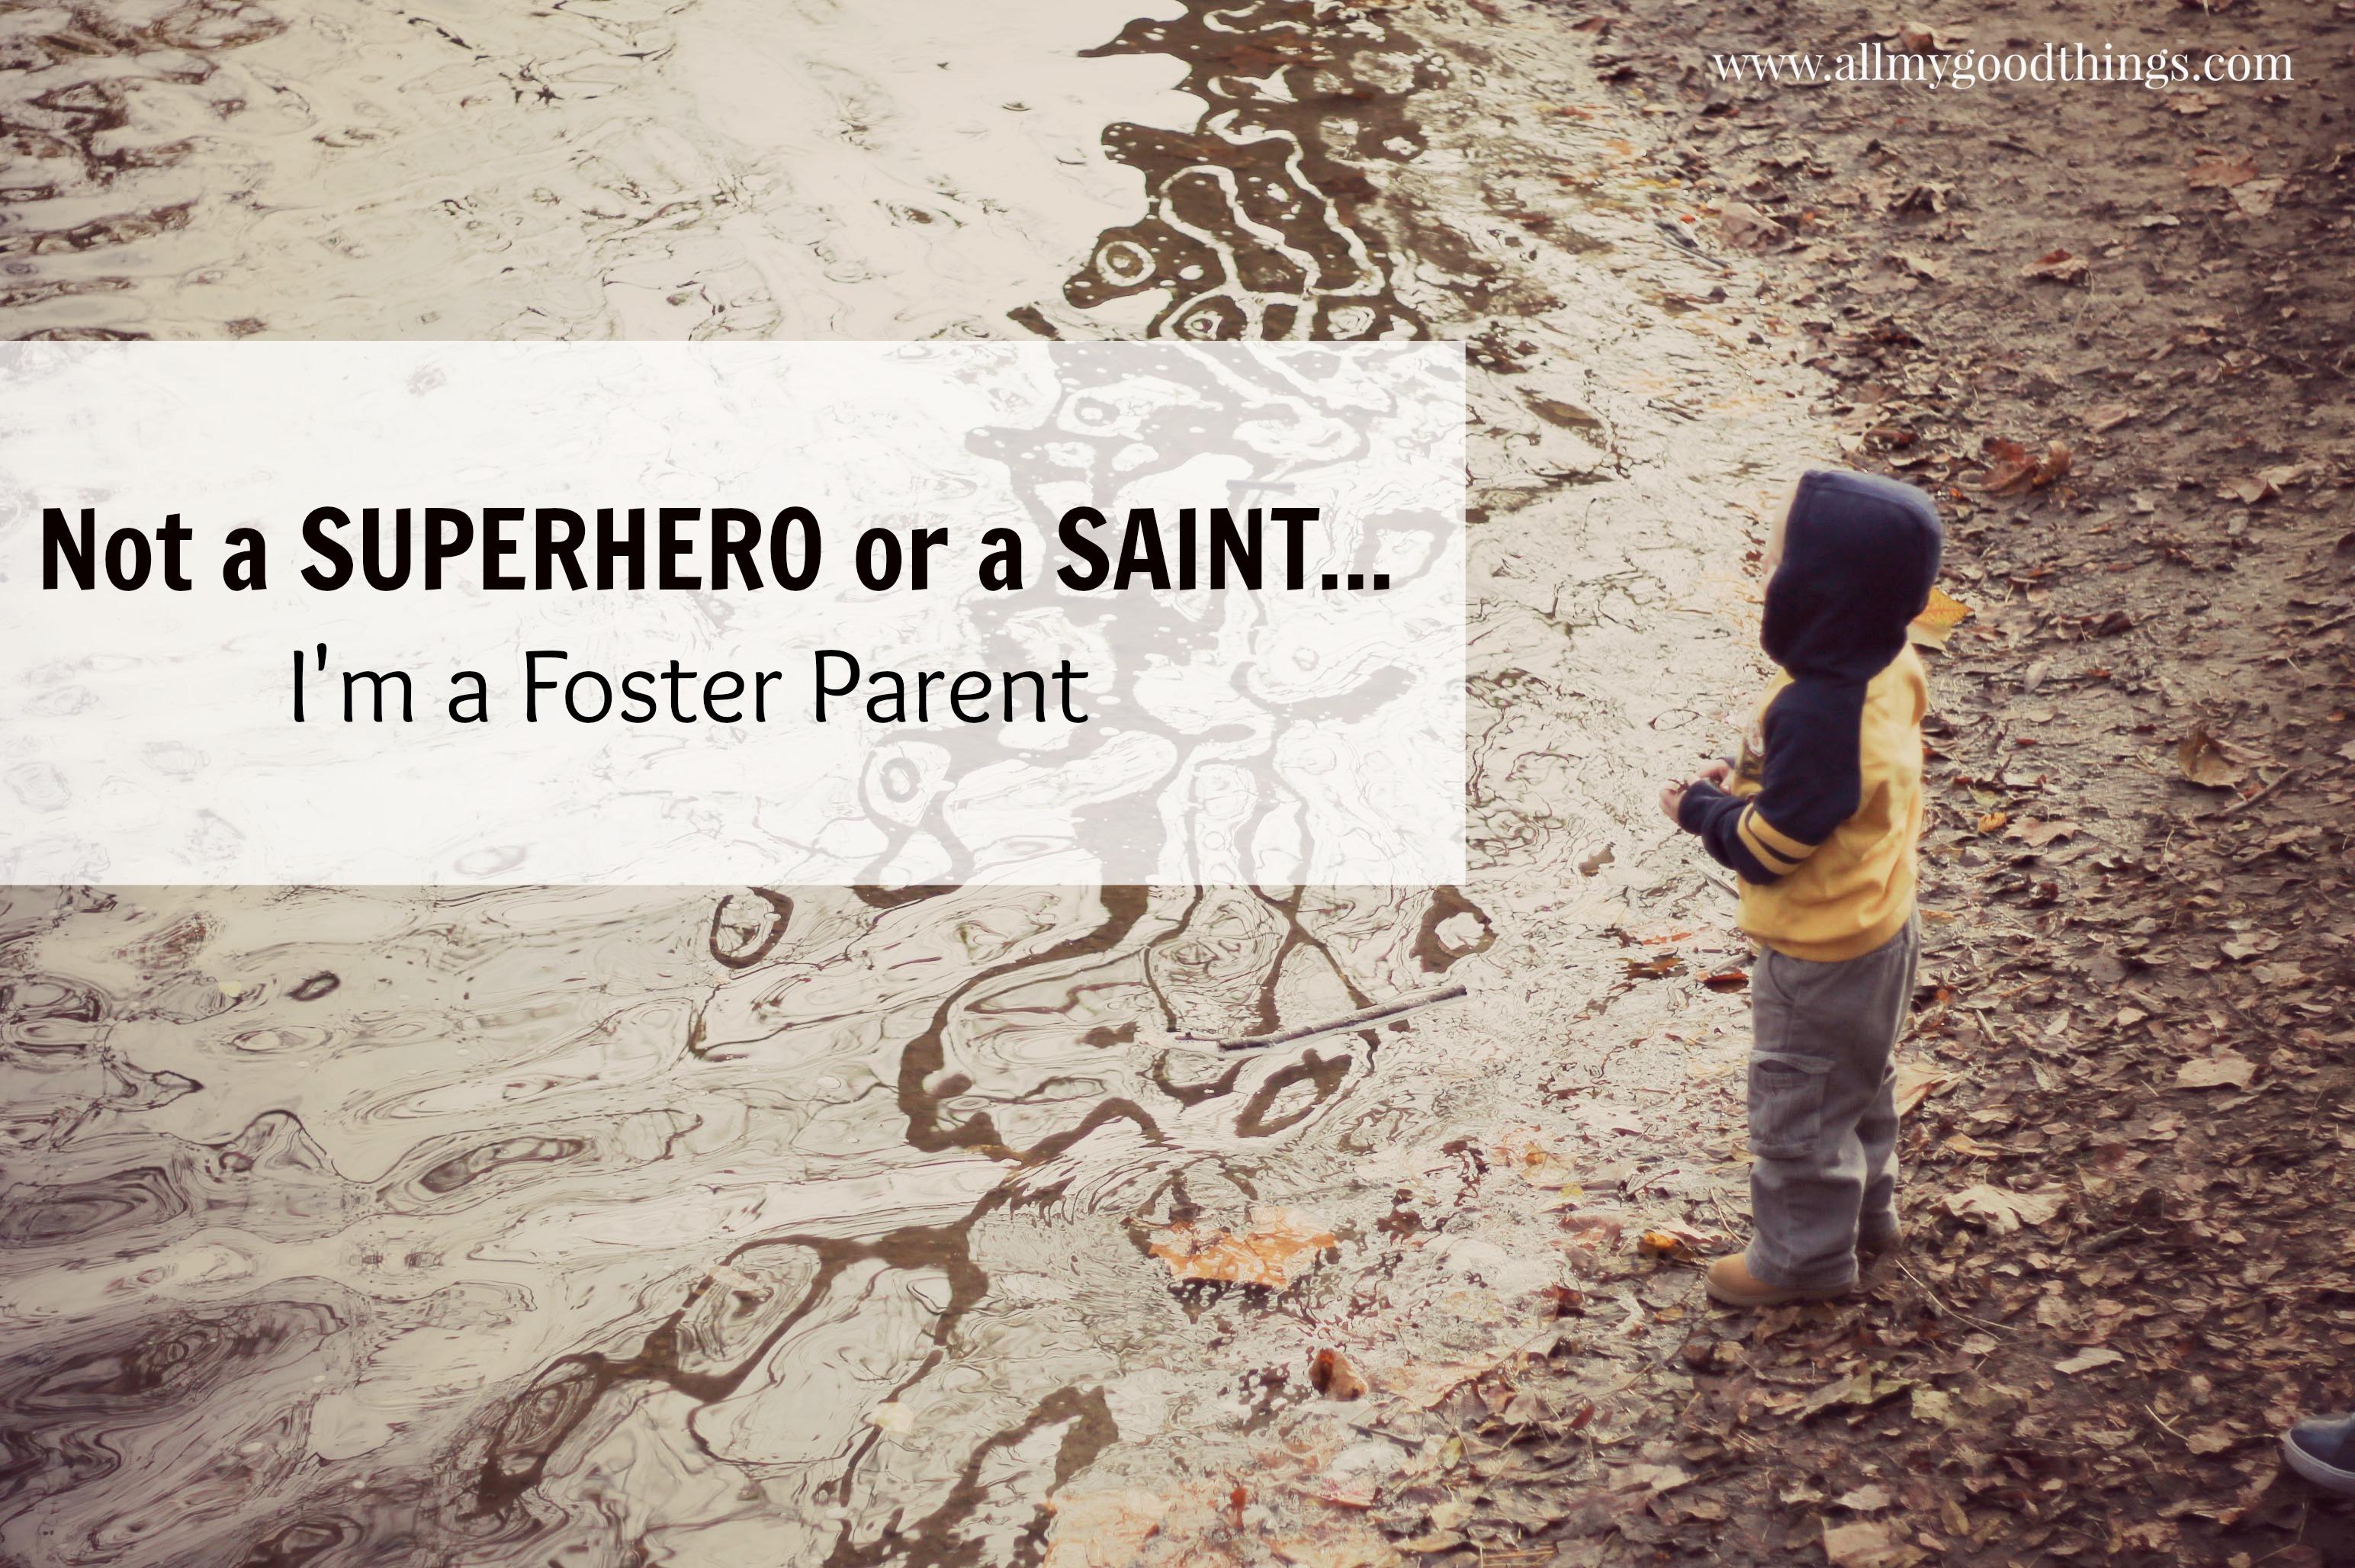 Not a Superhero or a Saint – I'm a Foster Parent